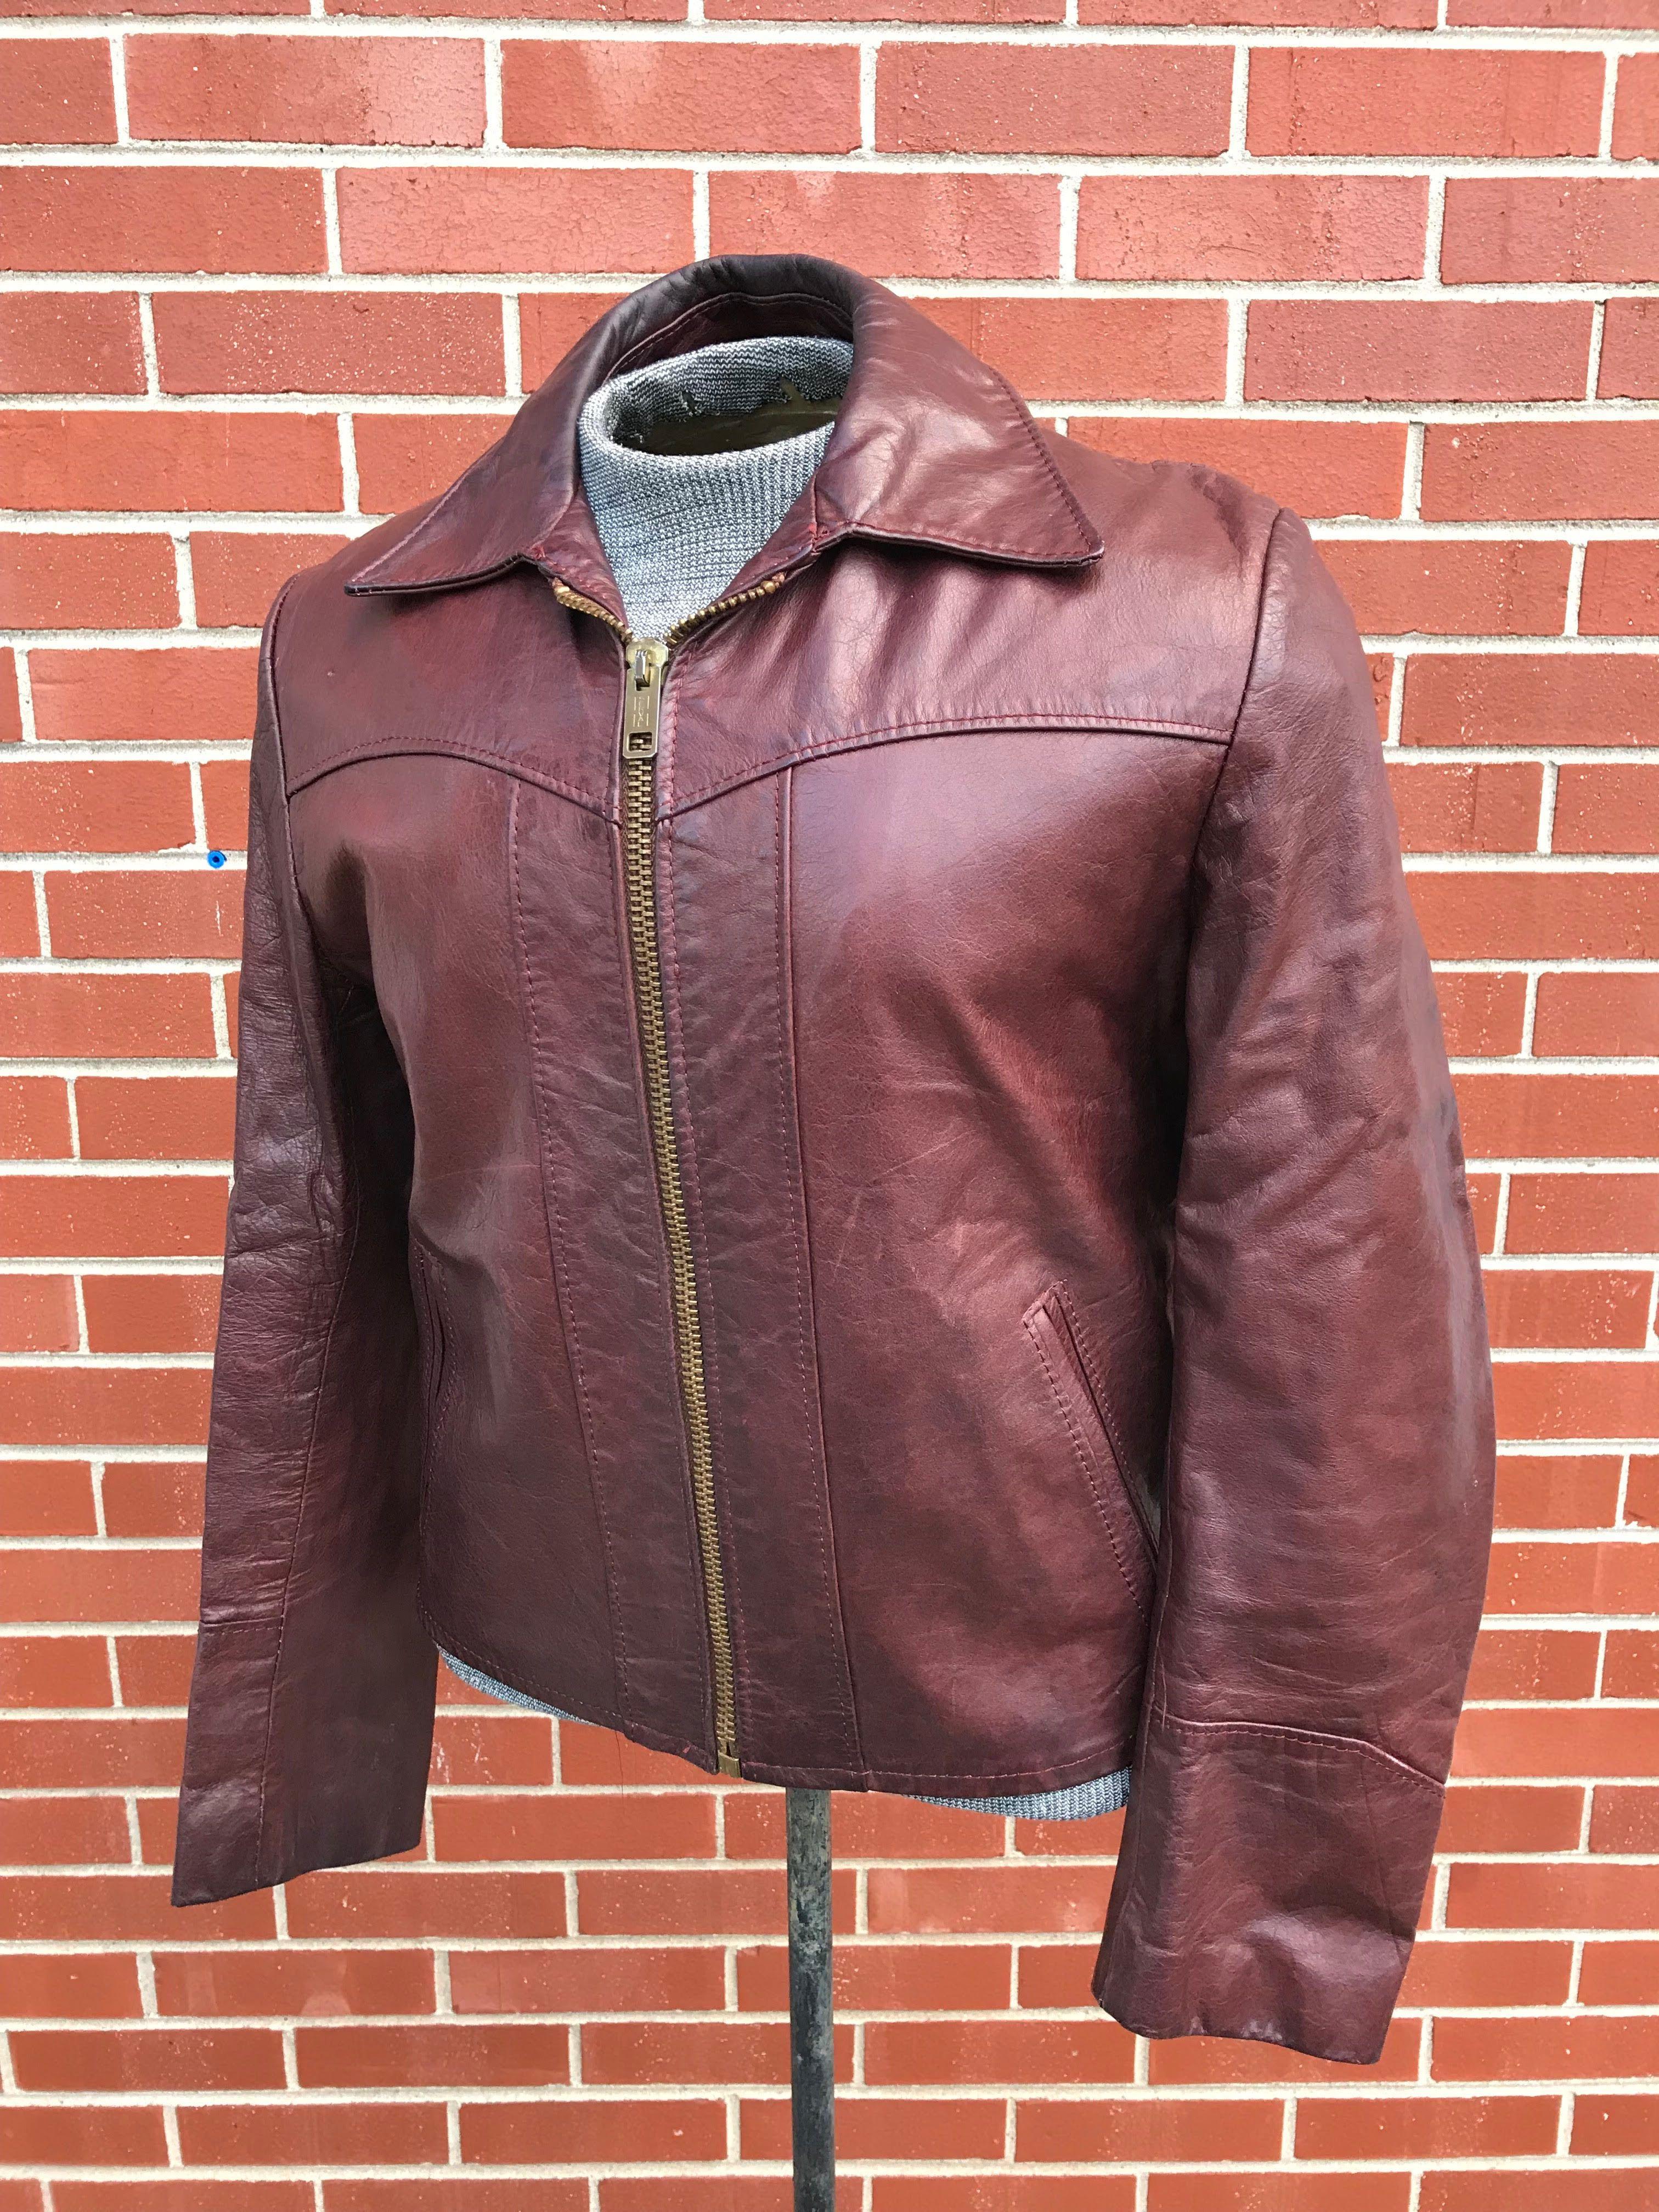 Vintage Men S 1960 S 1970 S Leather Jacket Leather Jacket Men Style Leather Jacket Men Leather Jacket